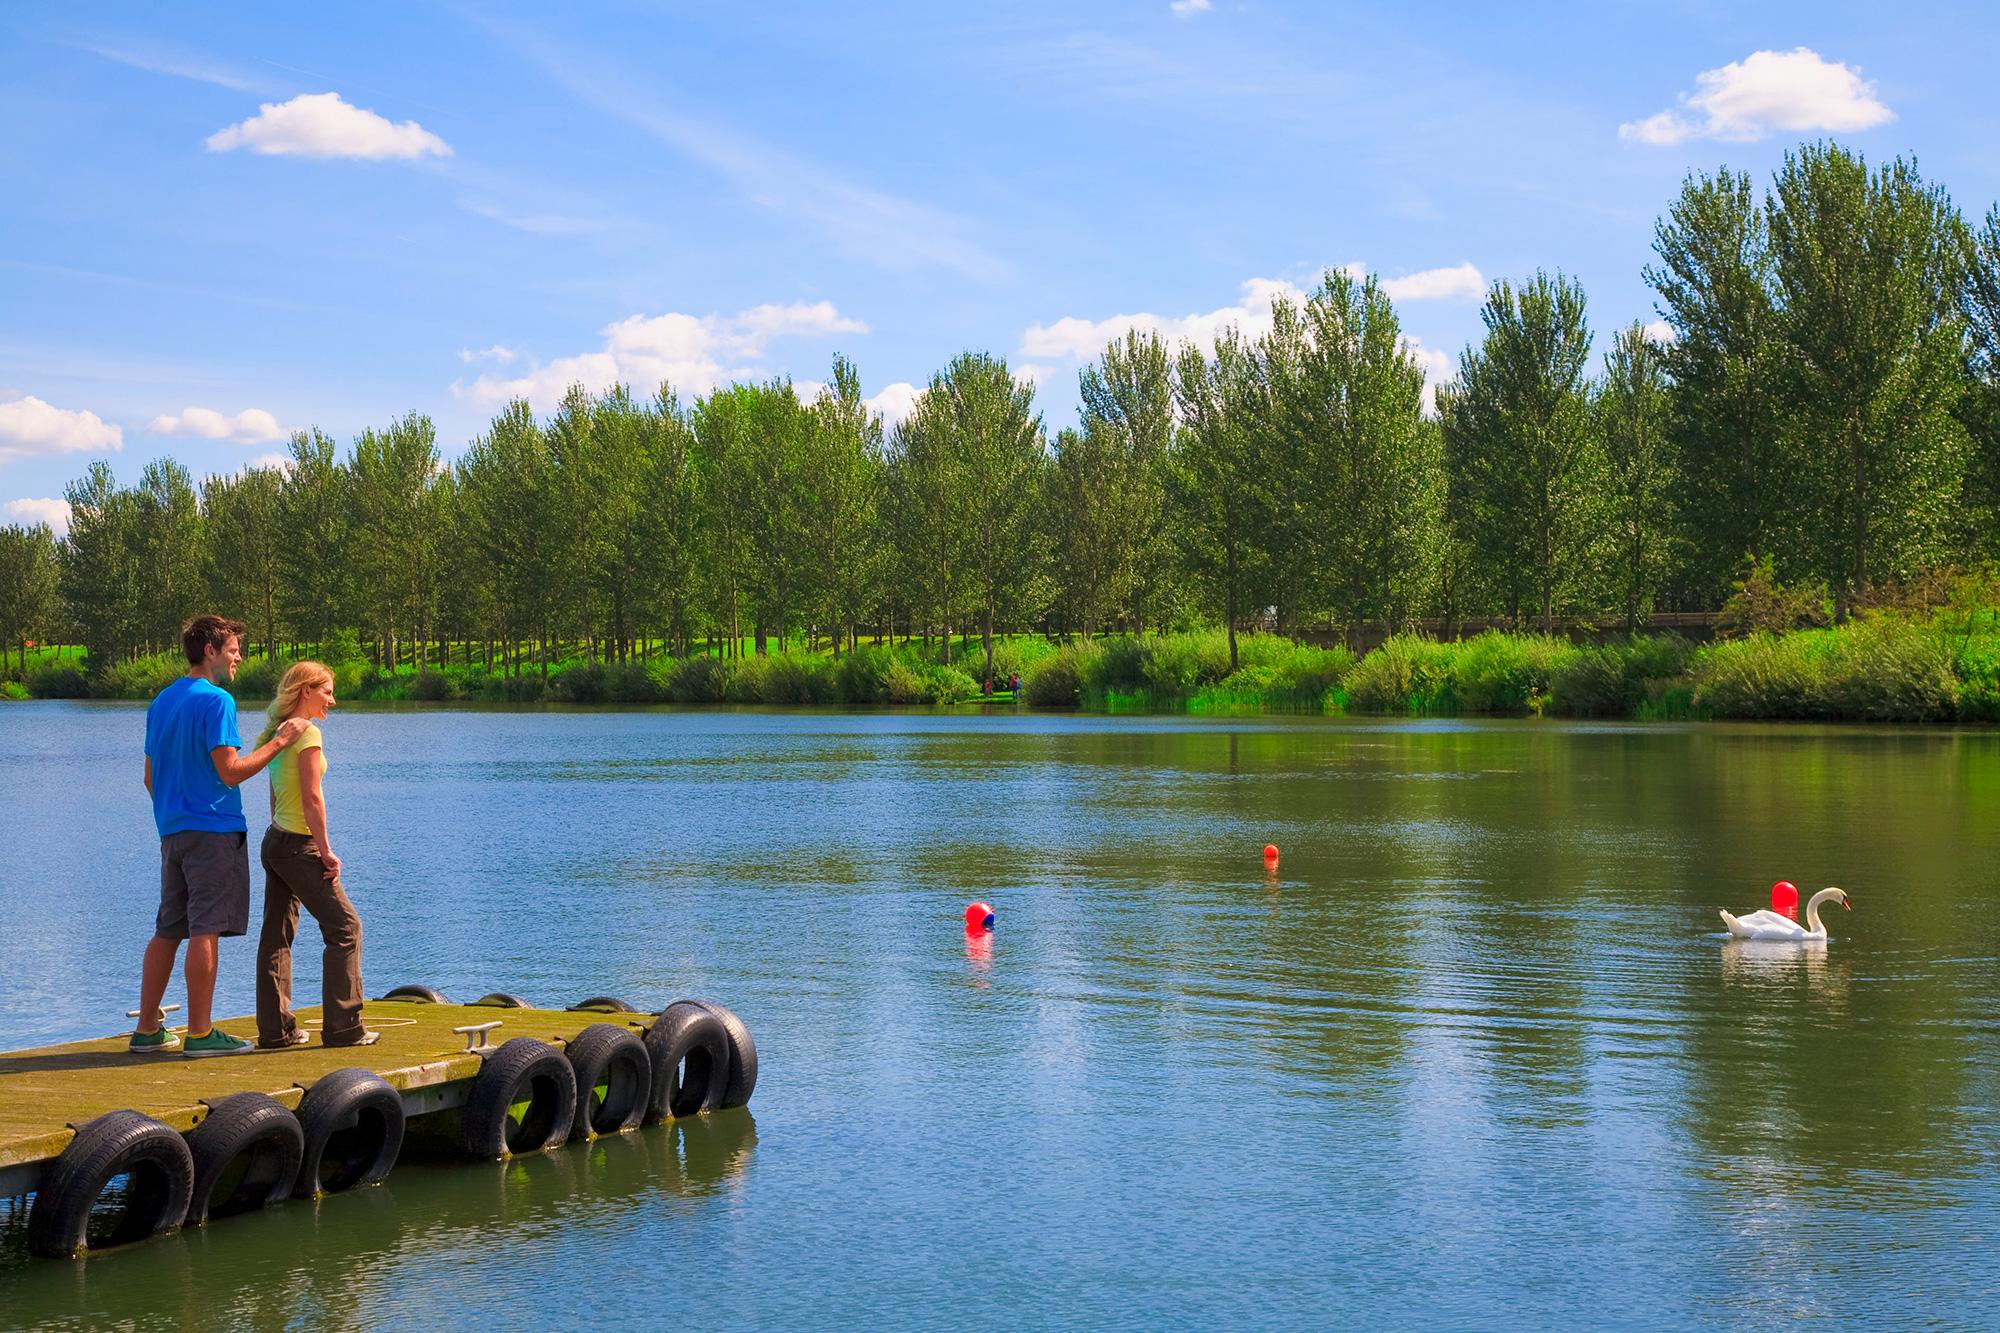 milton-keynes-willen-lake.jpg